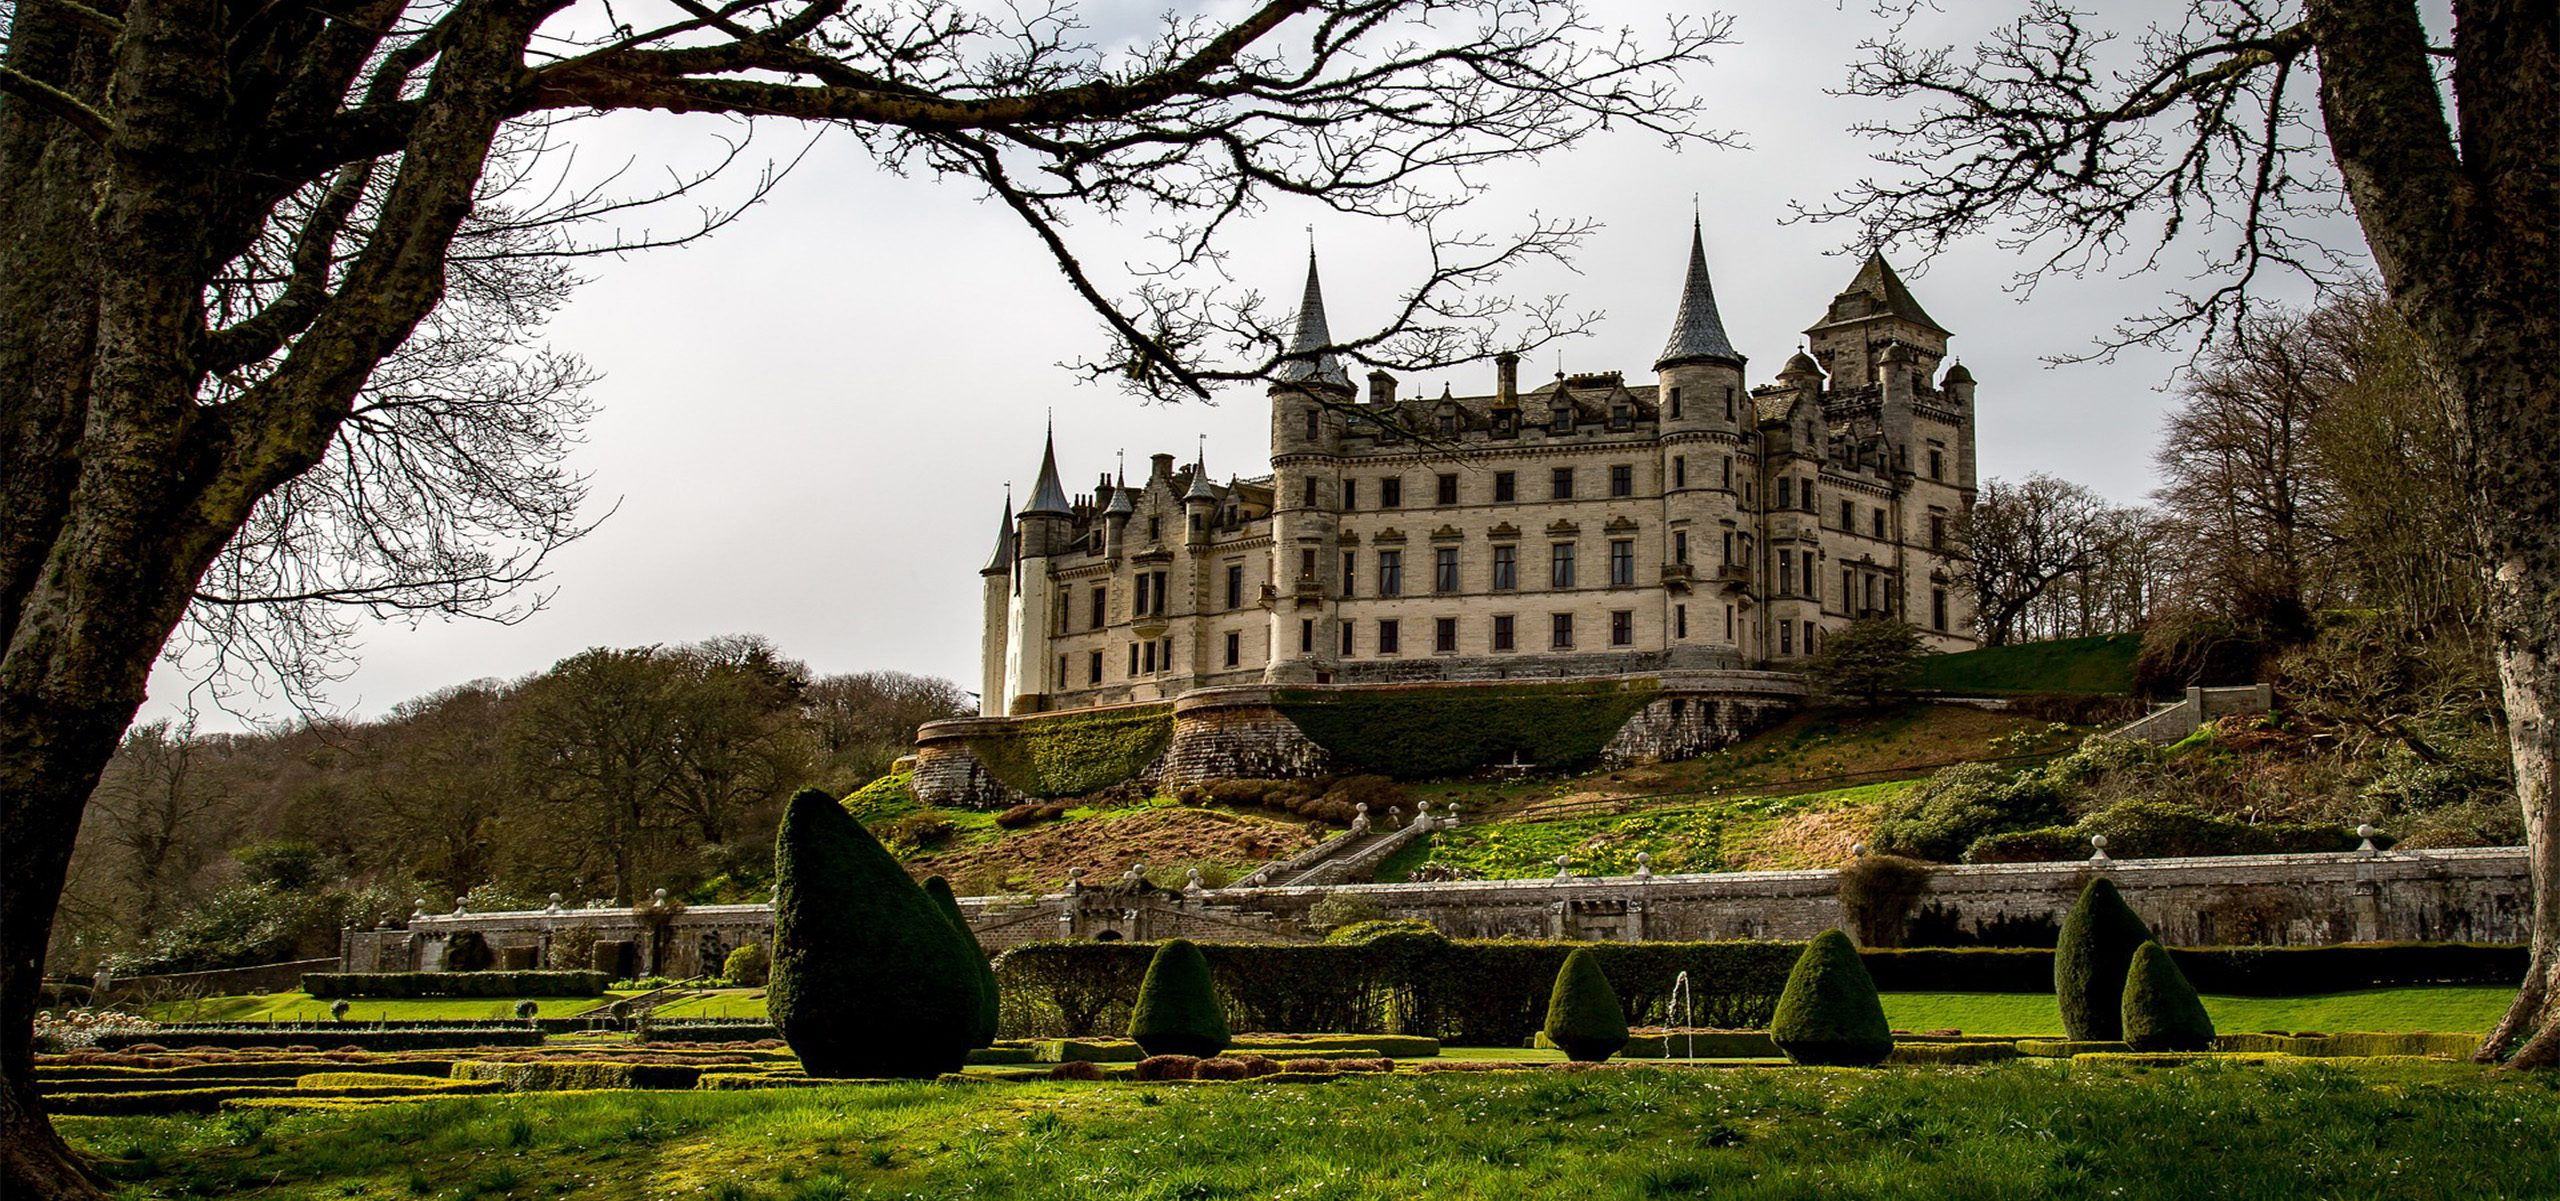 Scotland - Dunrobin Catsle